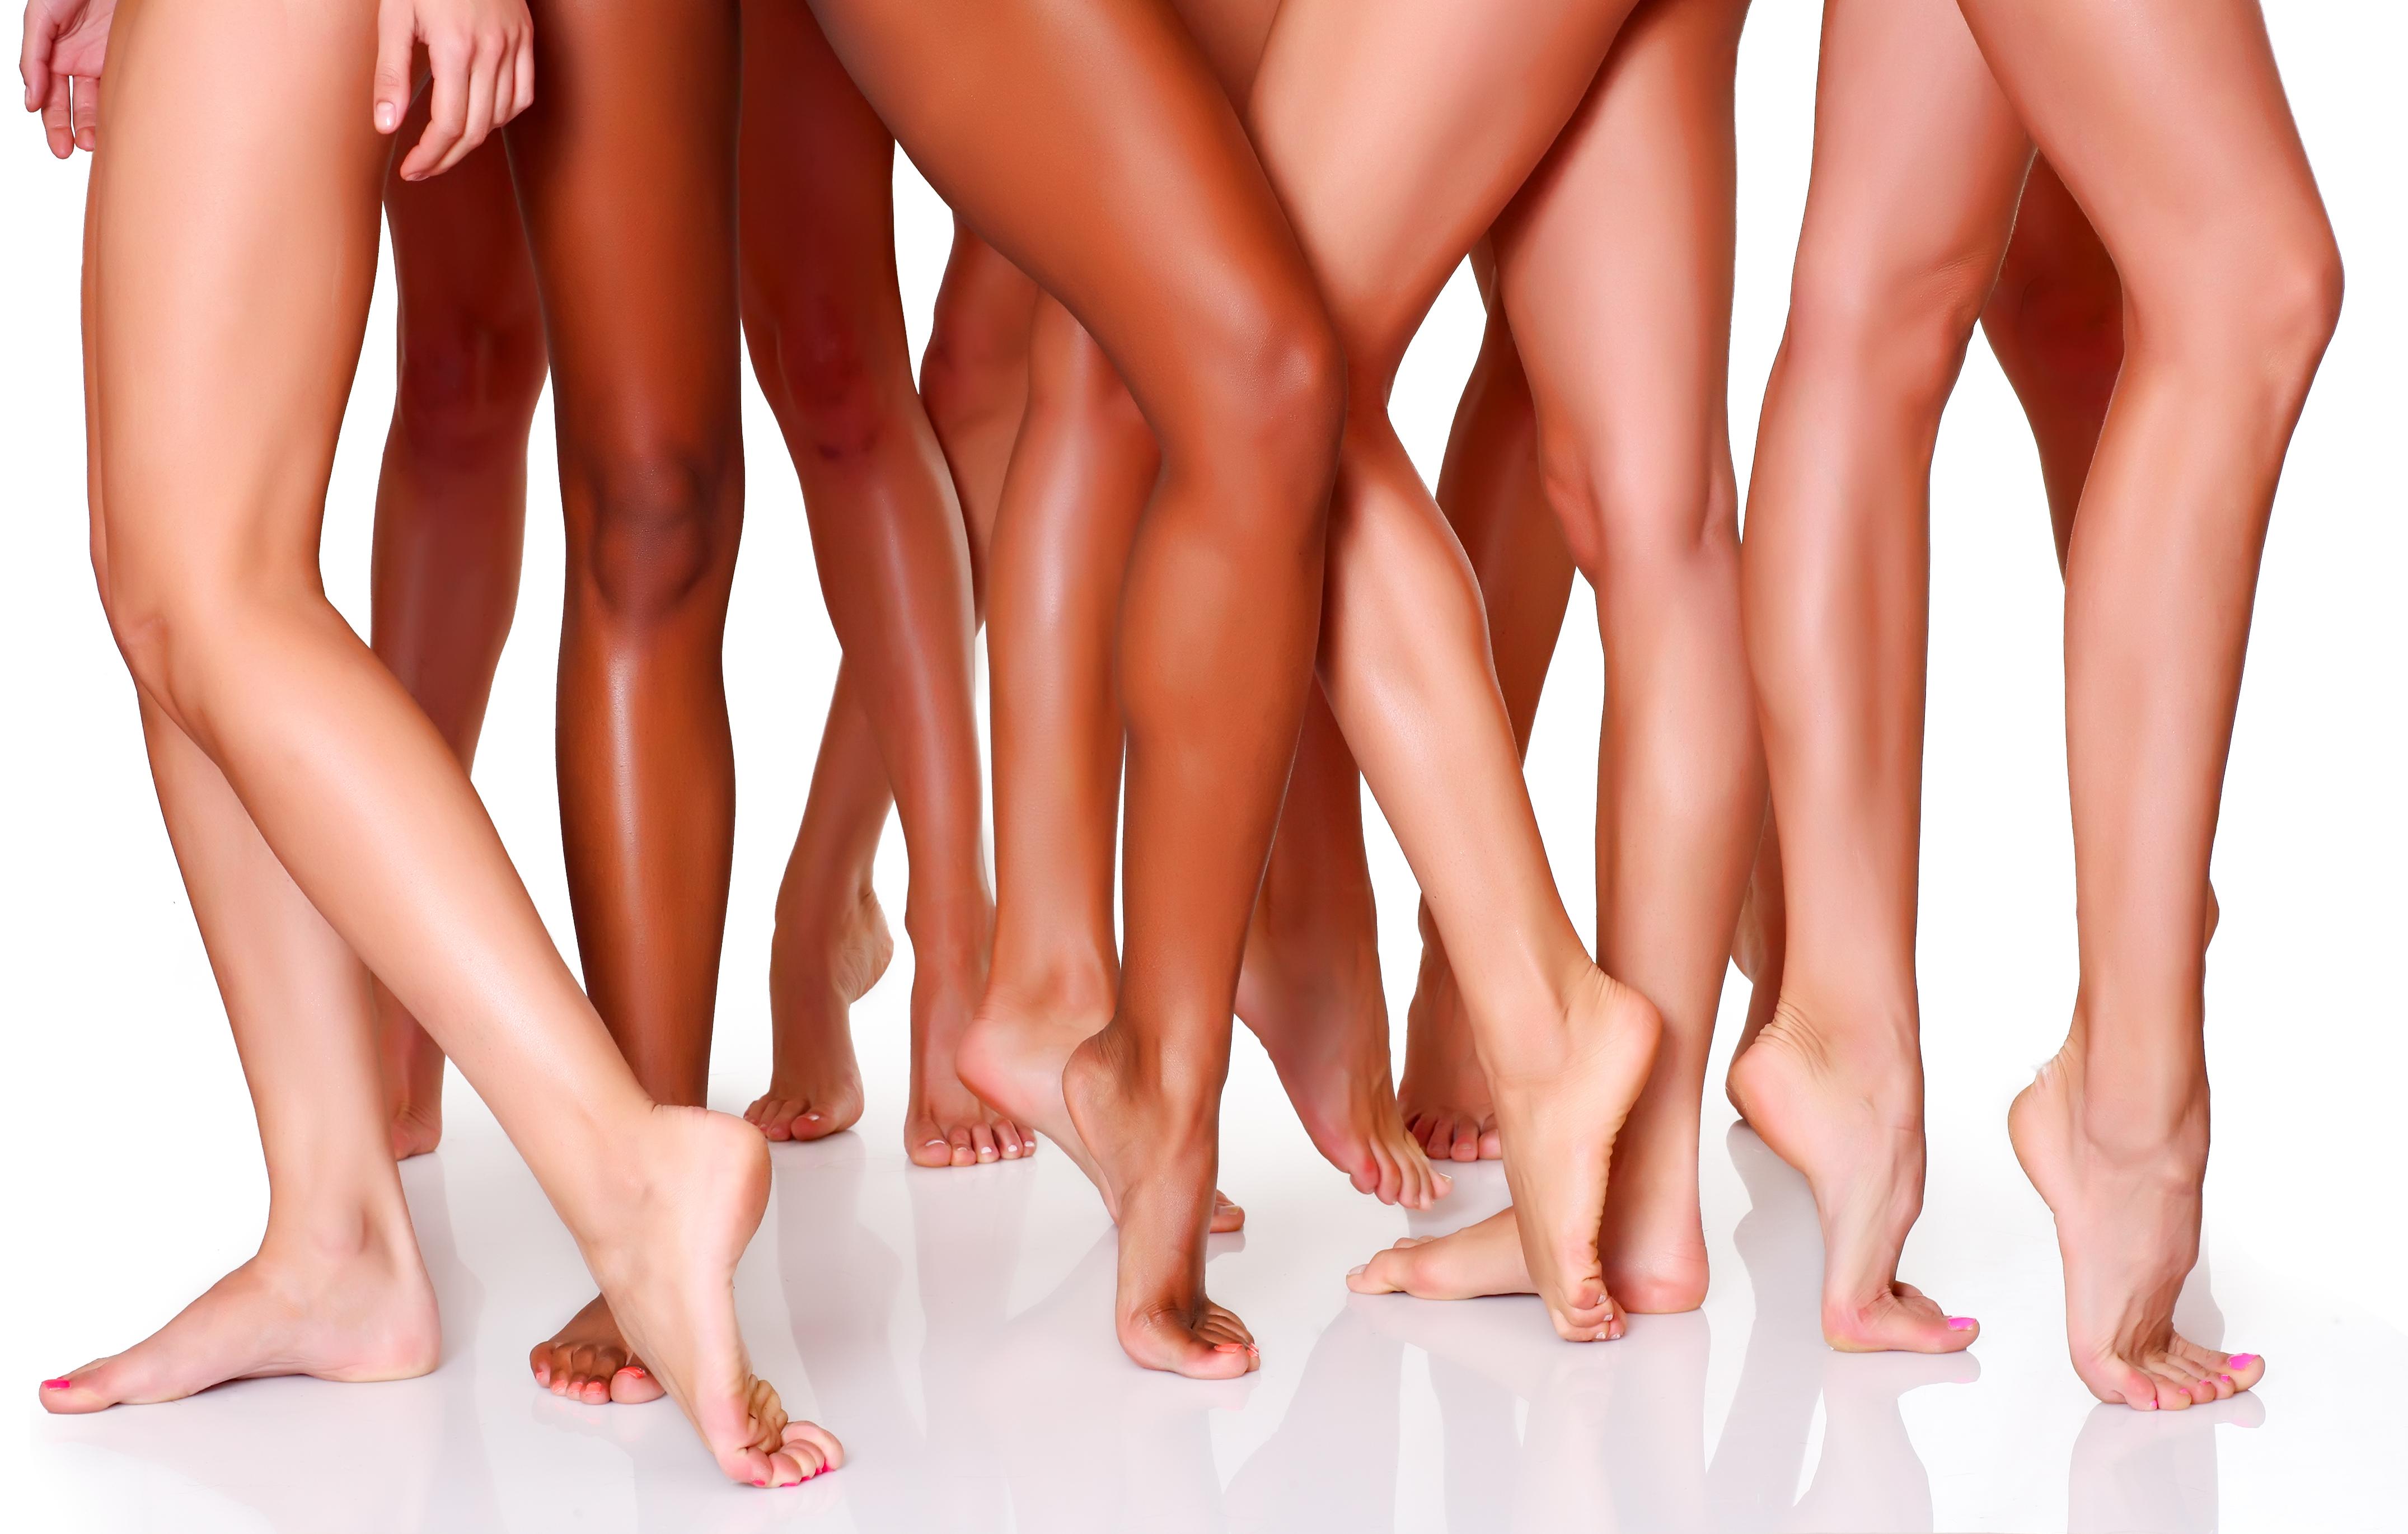 Body Image for Girls